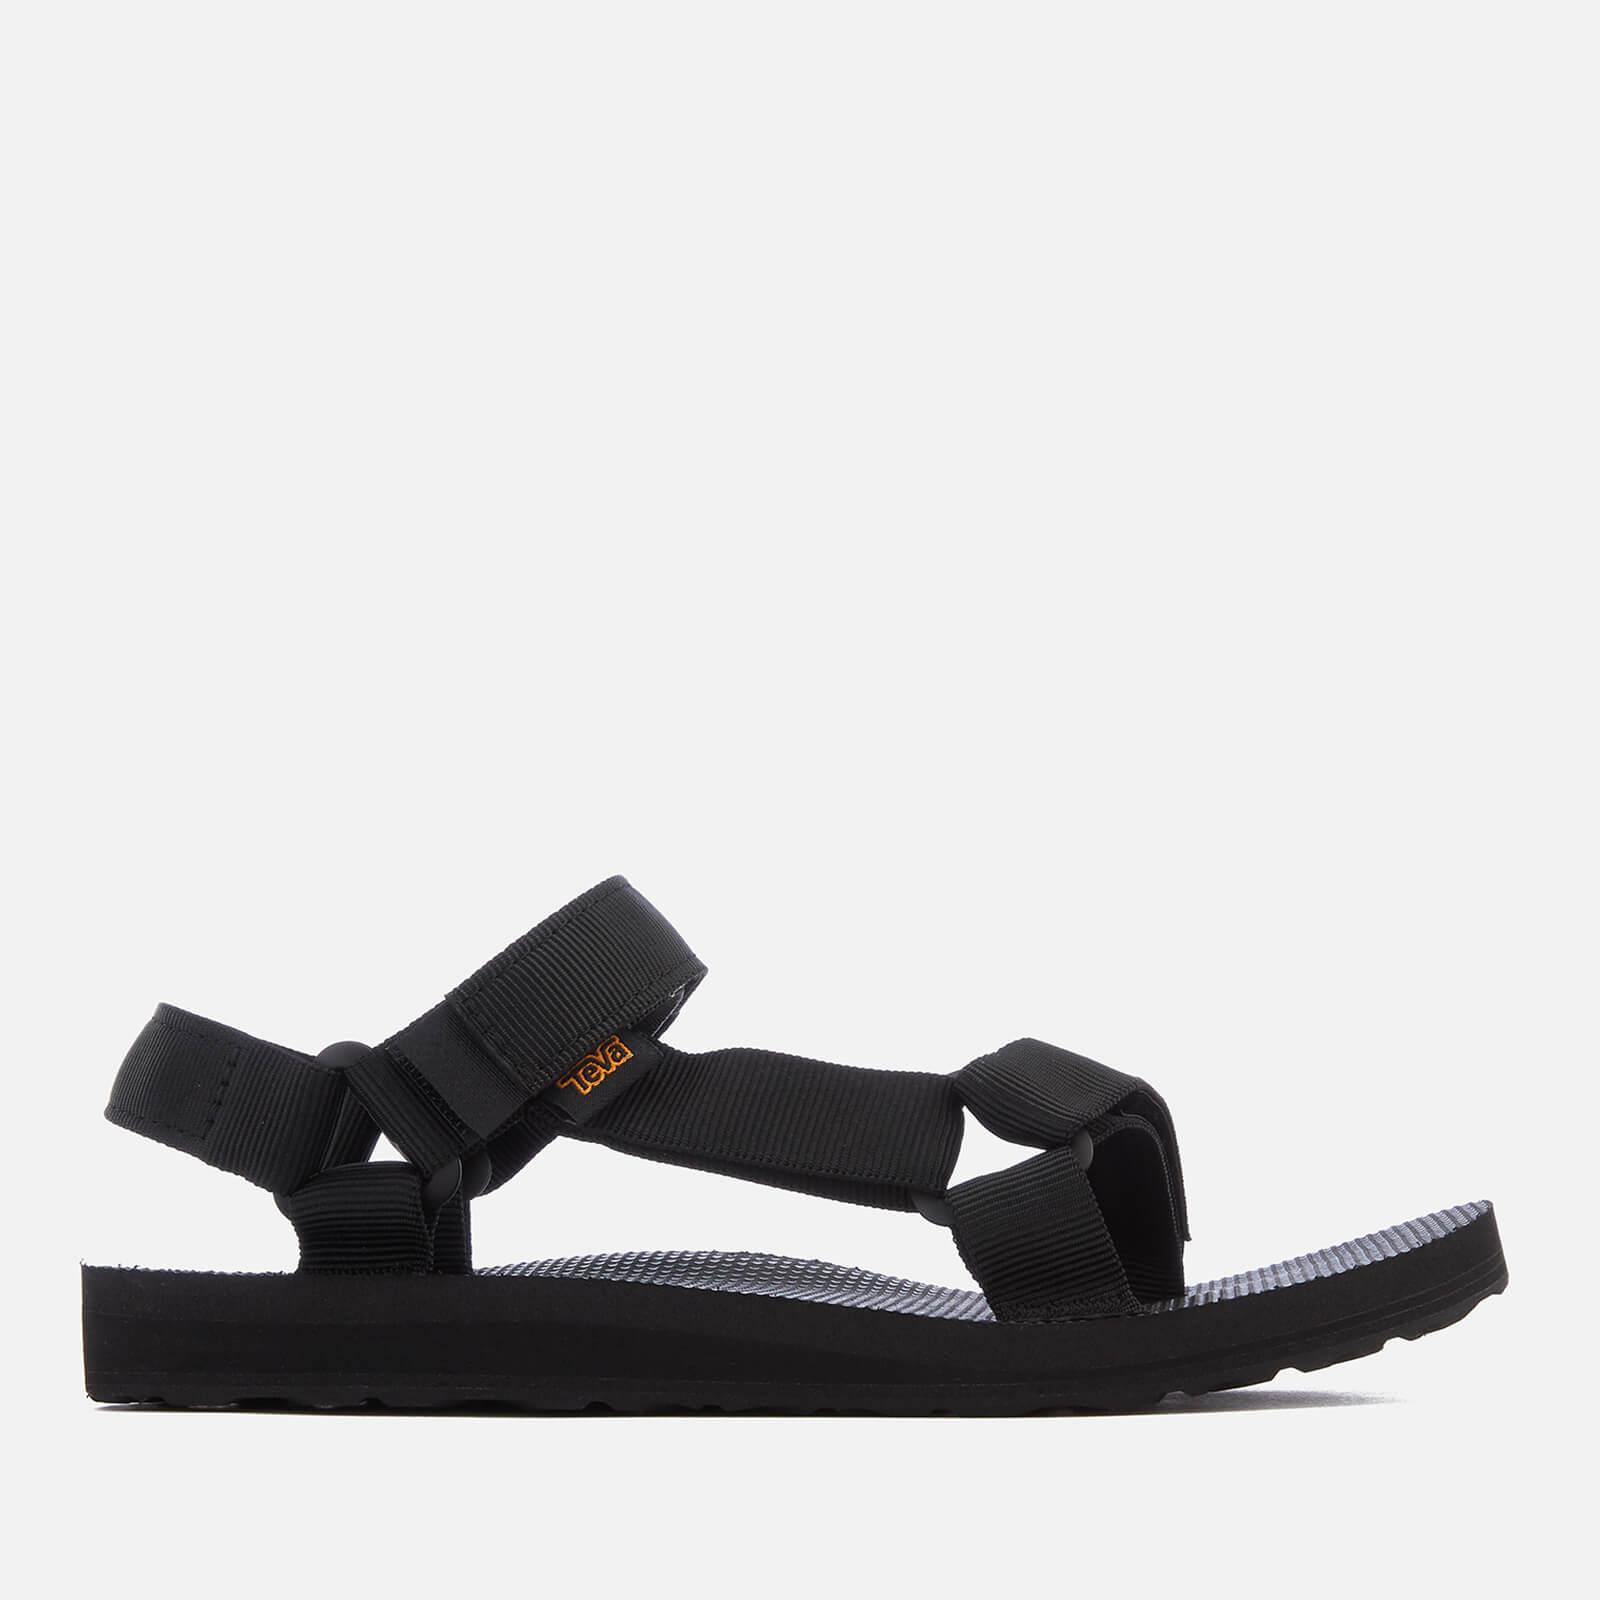 Teva Women's Original Universal Sport Sandals - Black - UK 3